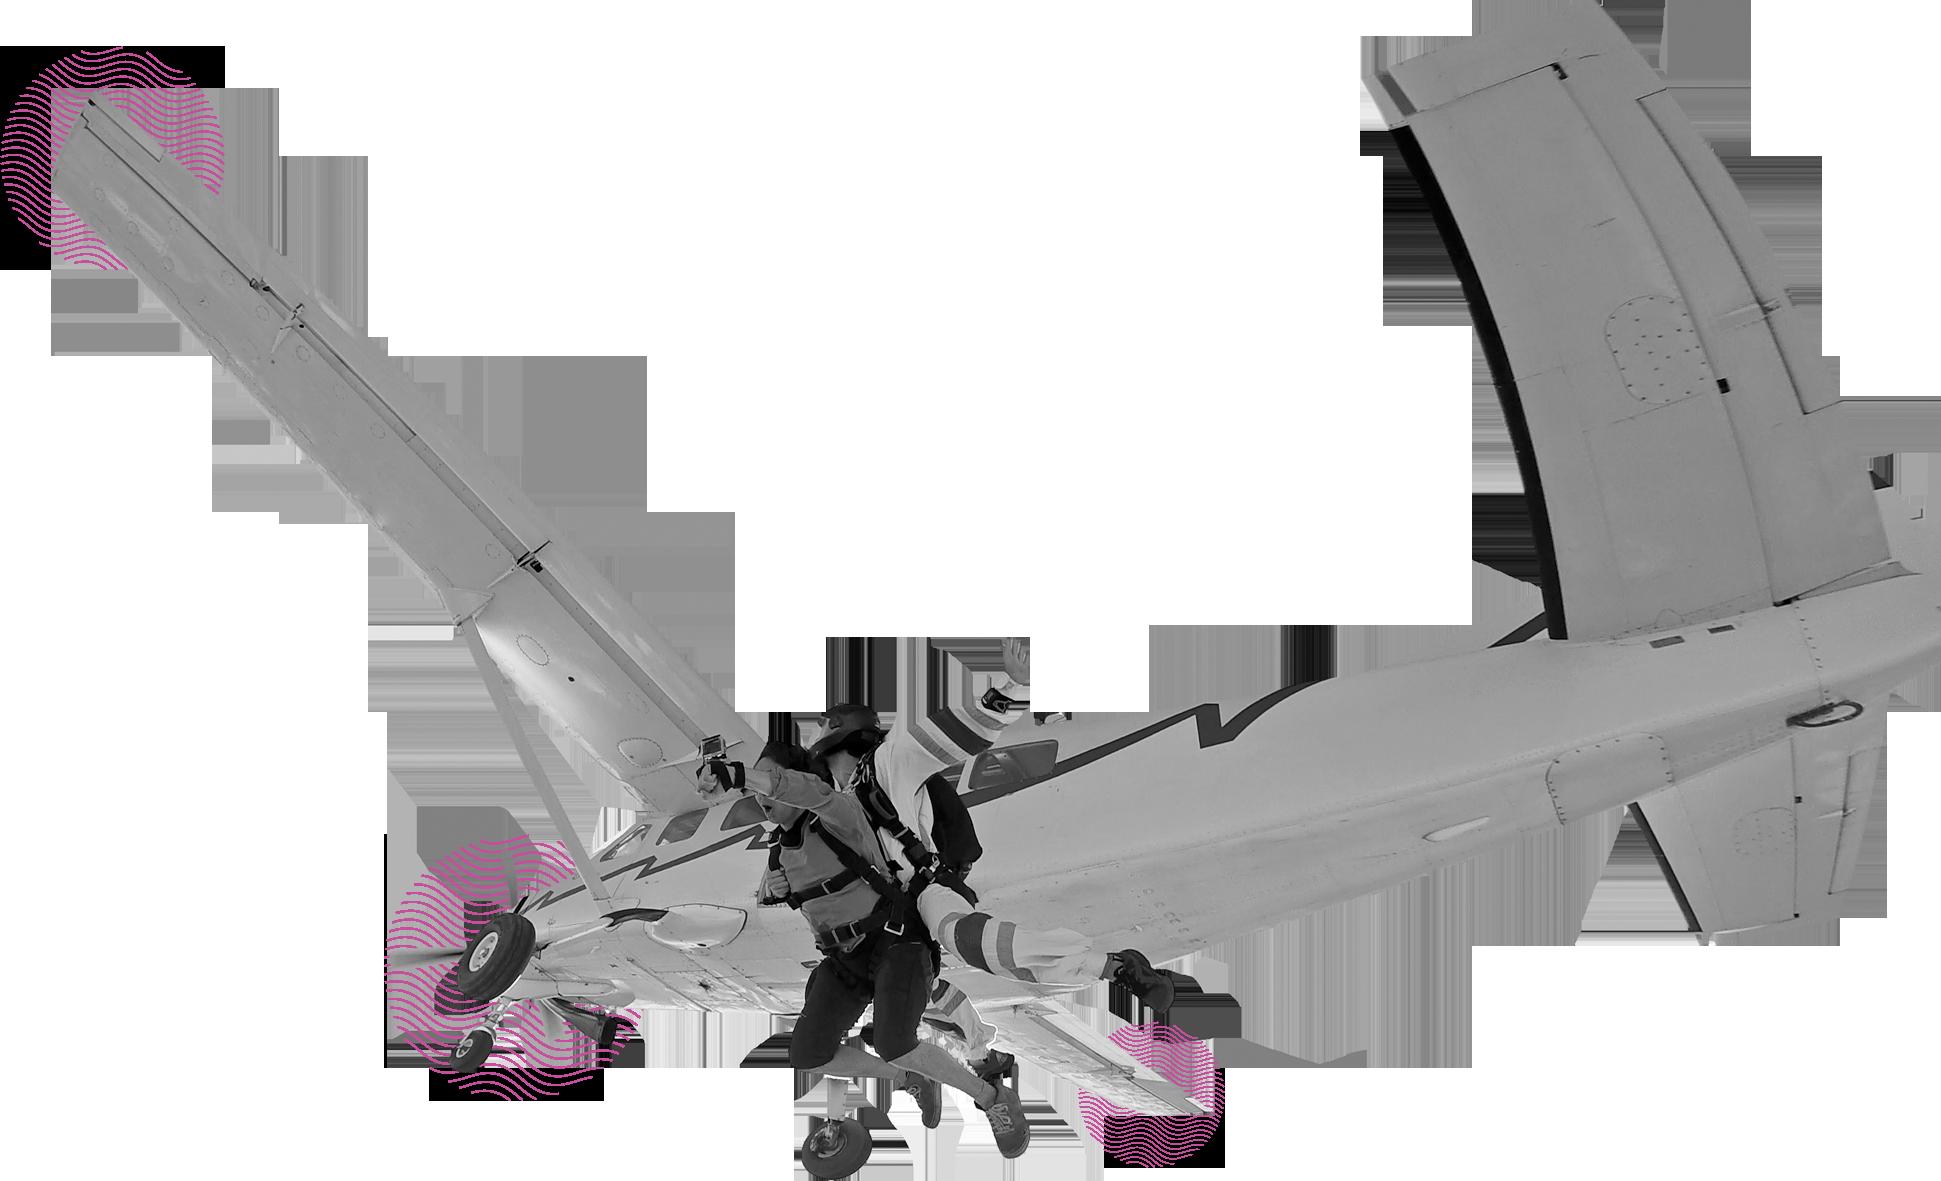 platform-plane-image